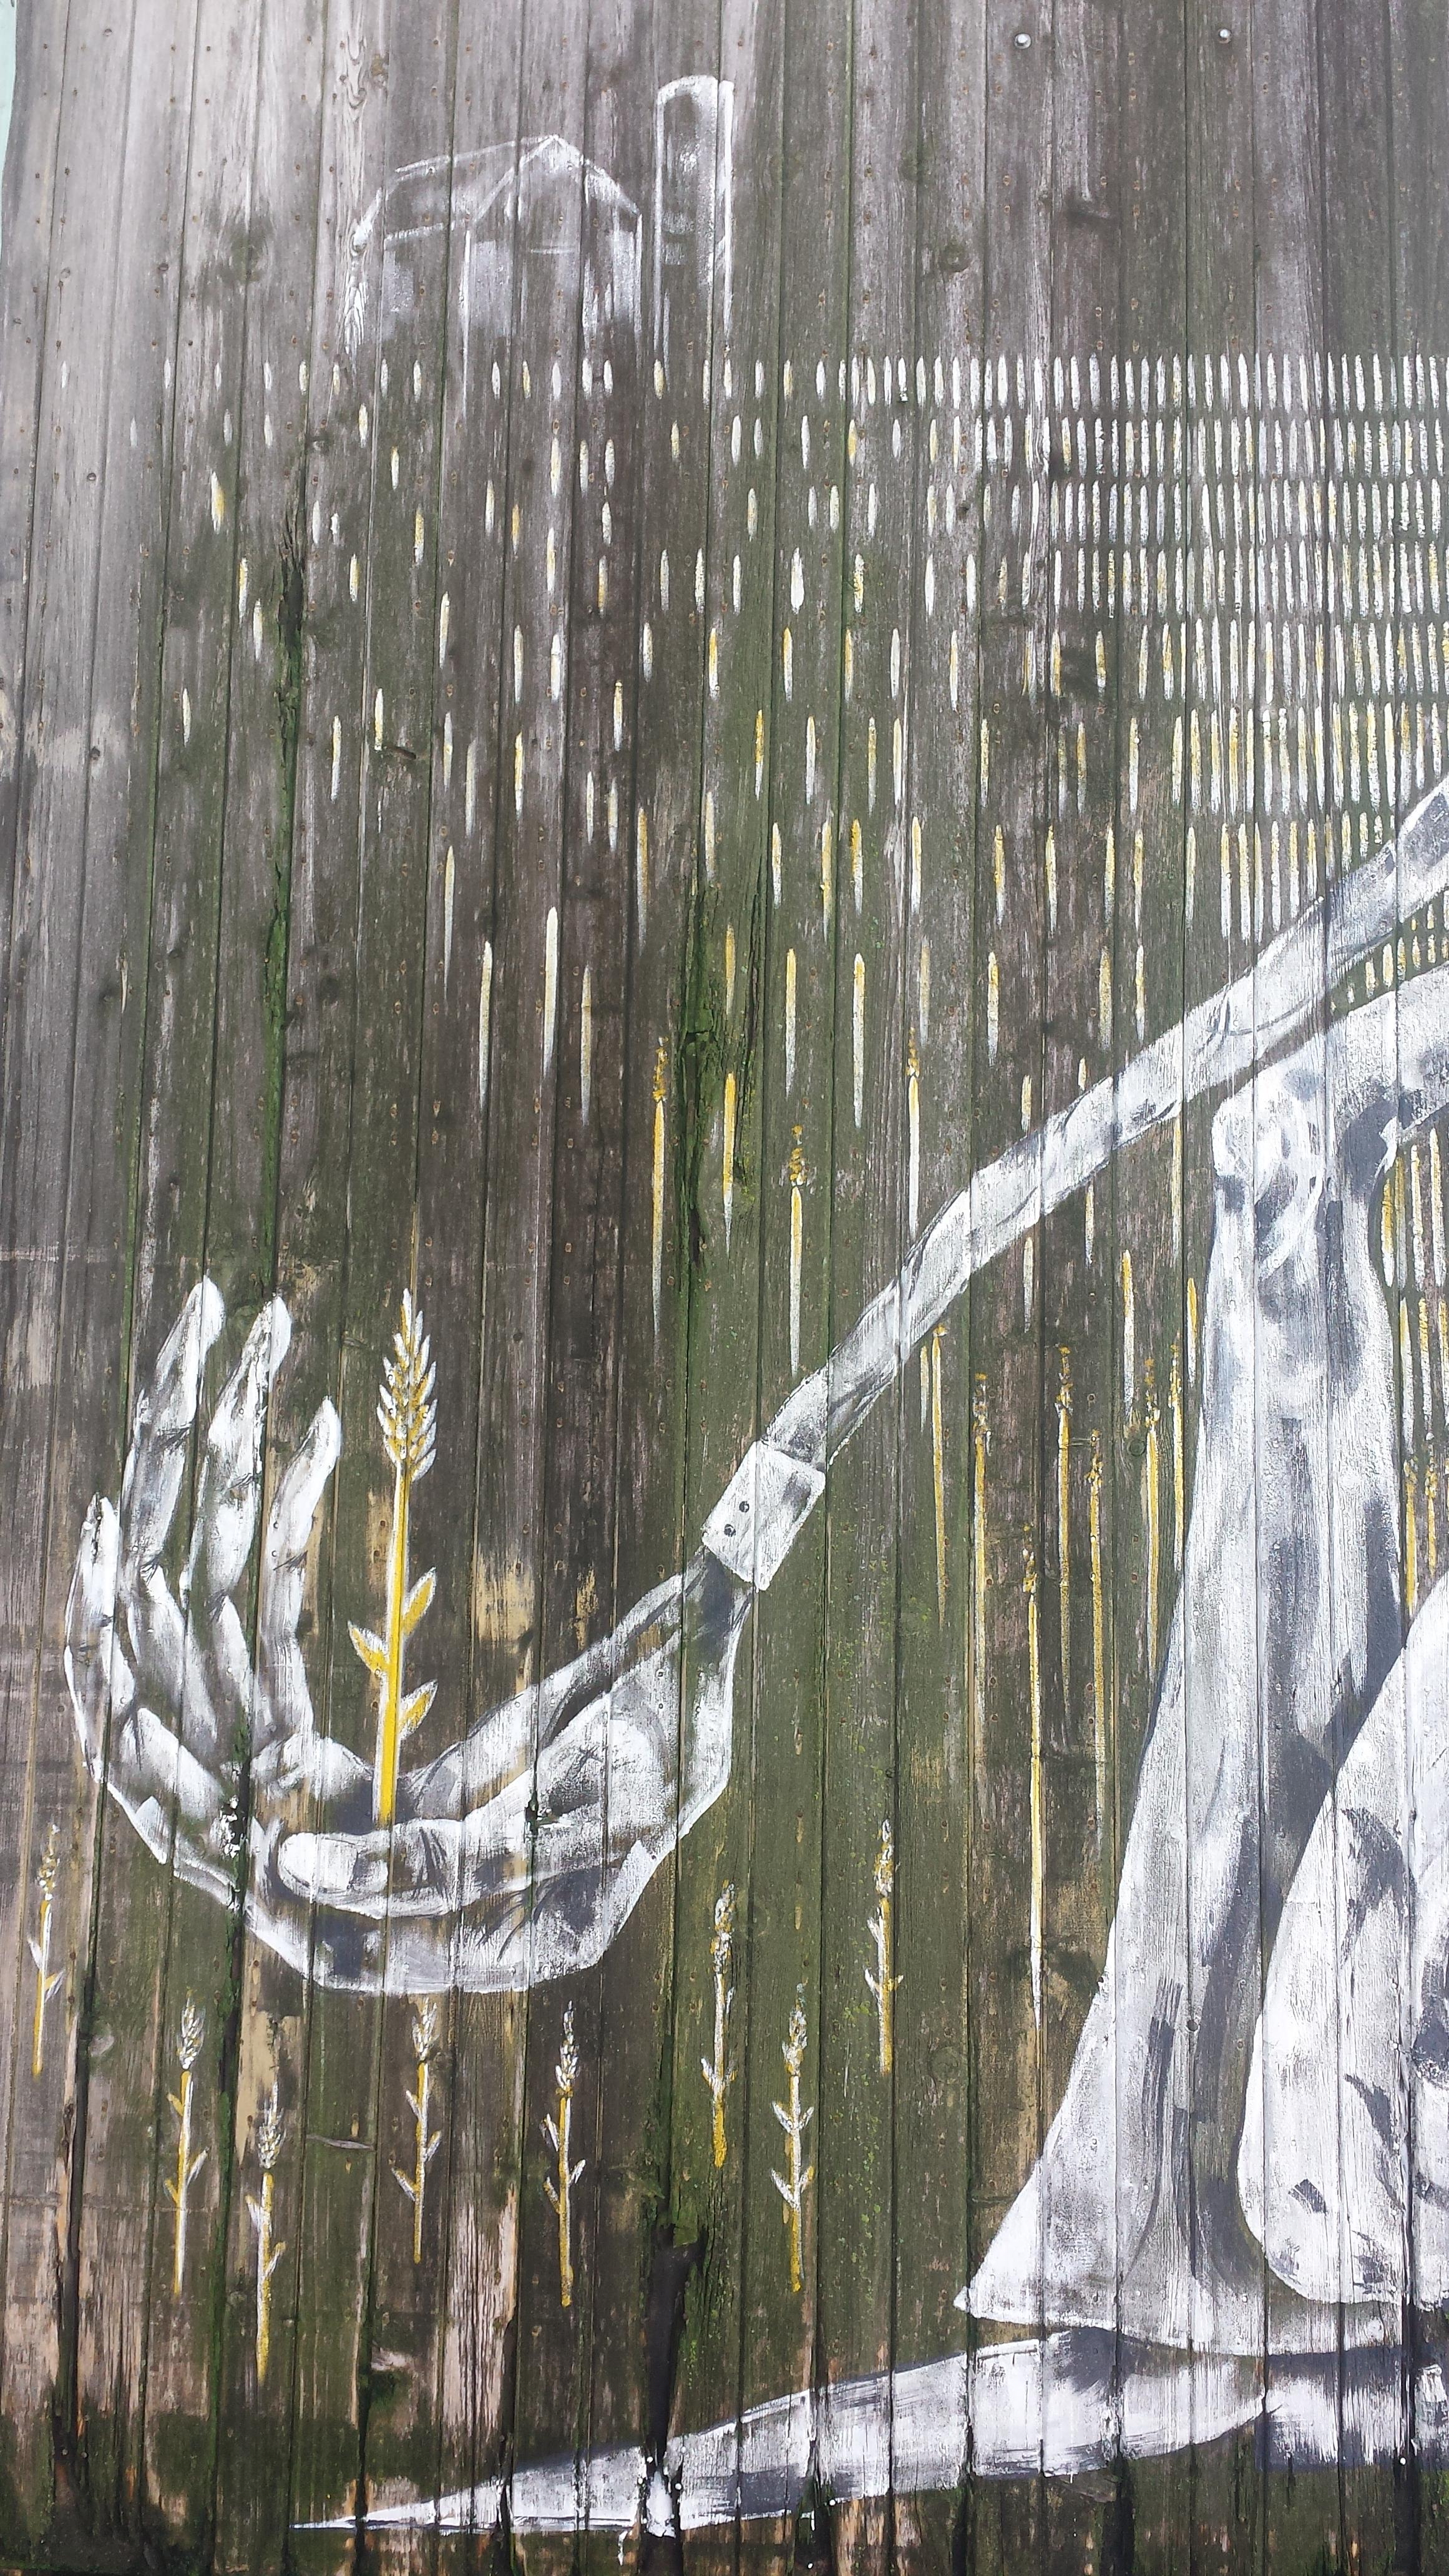 October 2016: Reedsburg Farmer's Co-op Mural